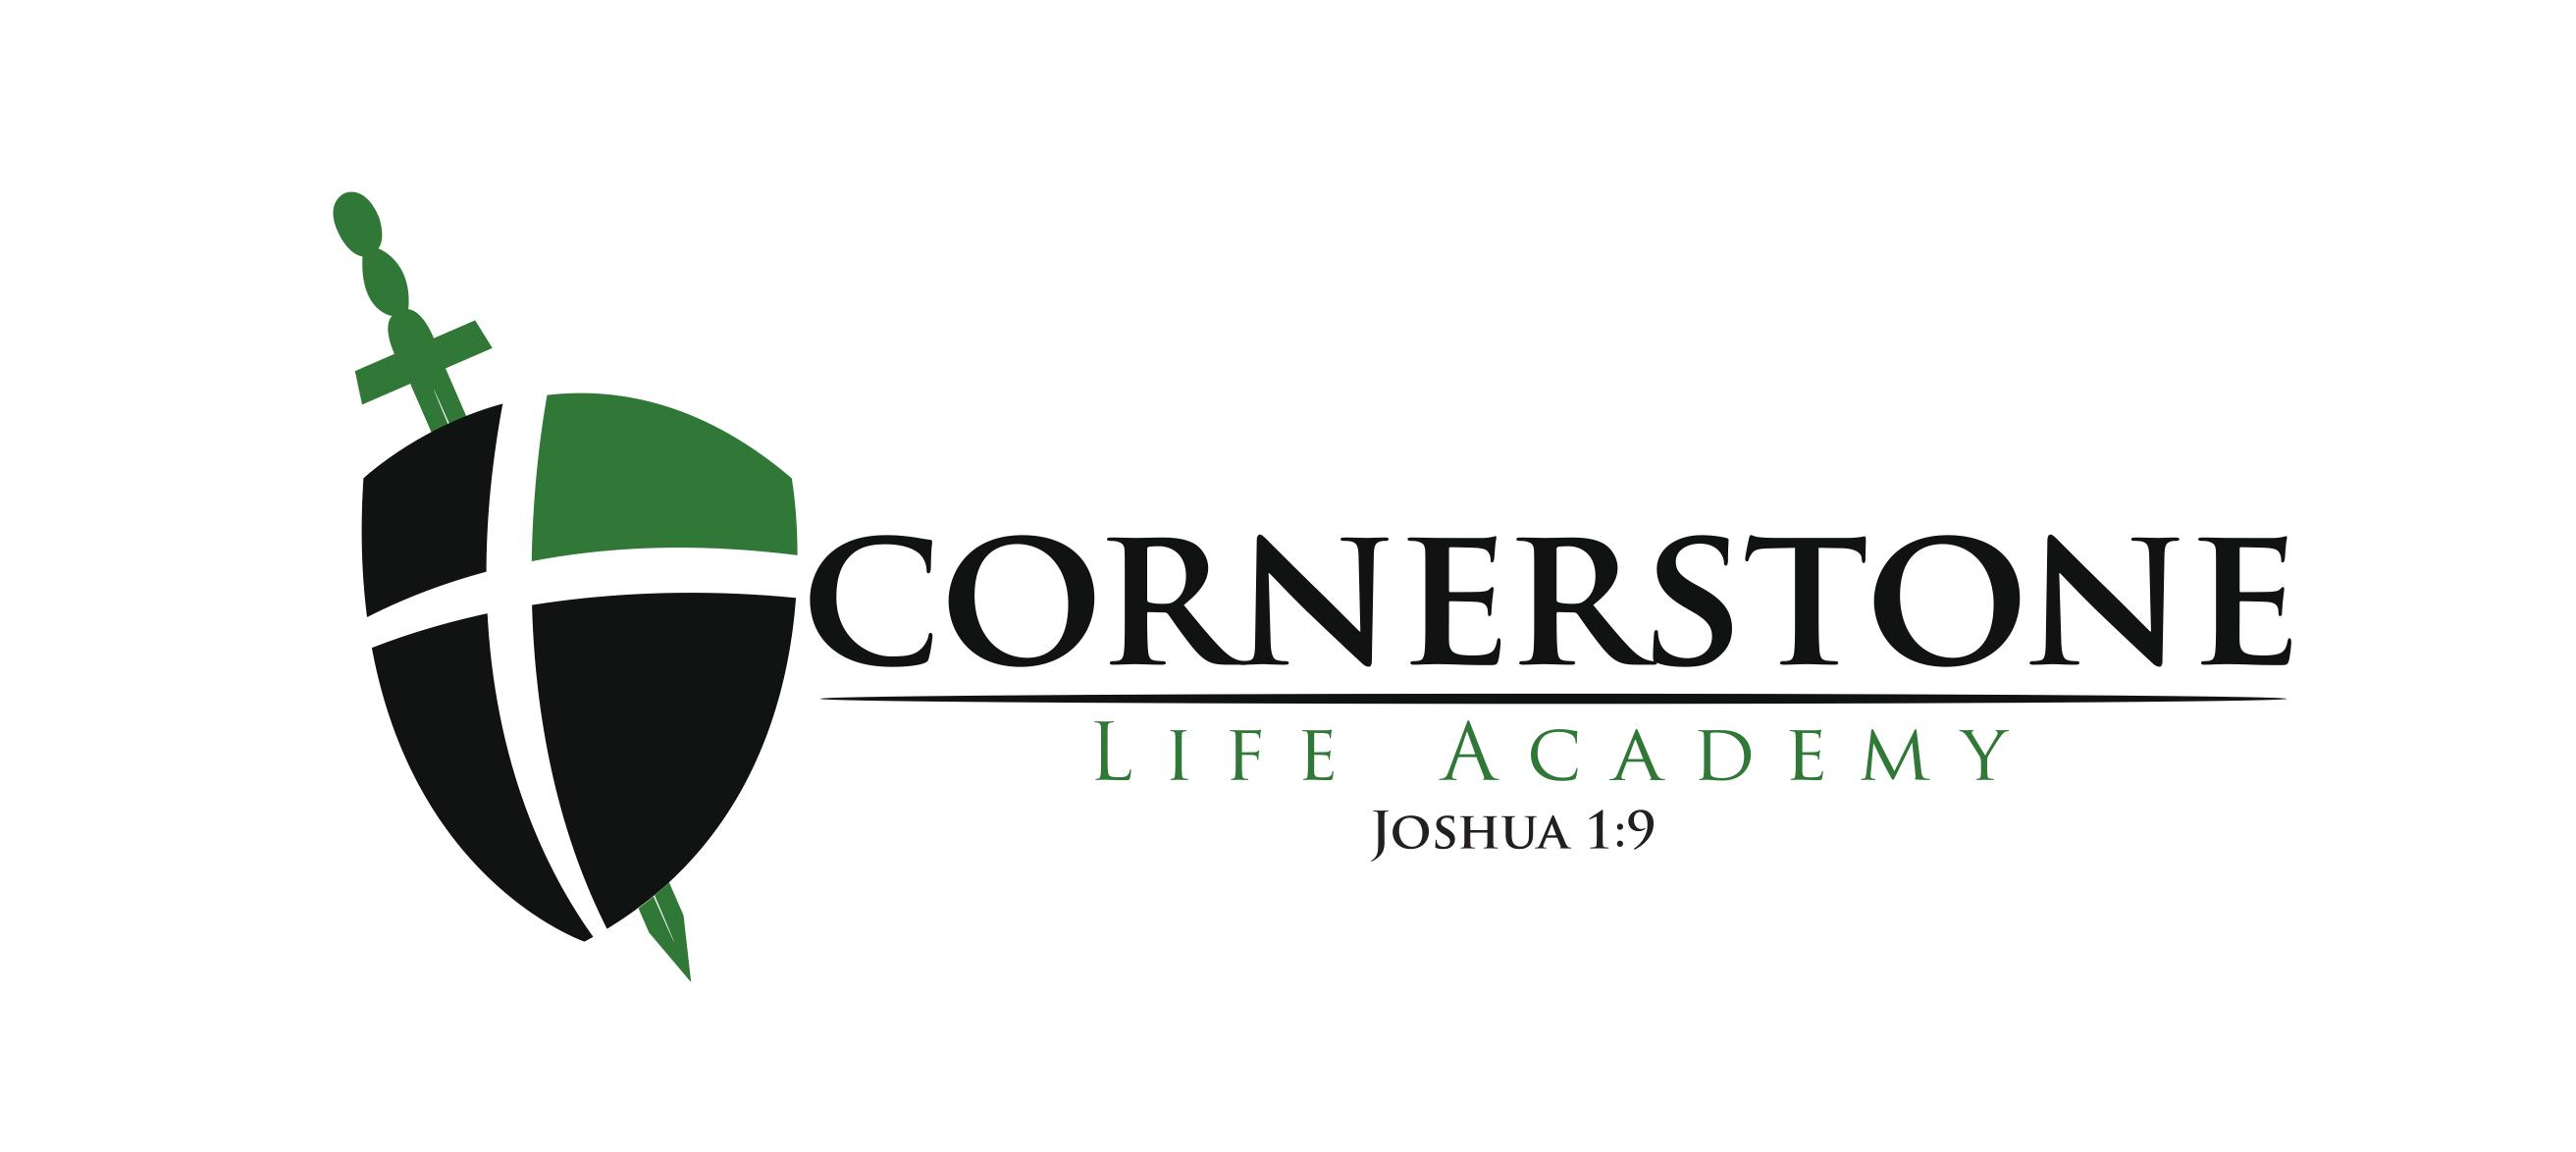 Cornerstone Life Academy